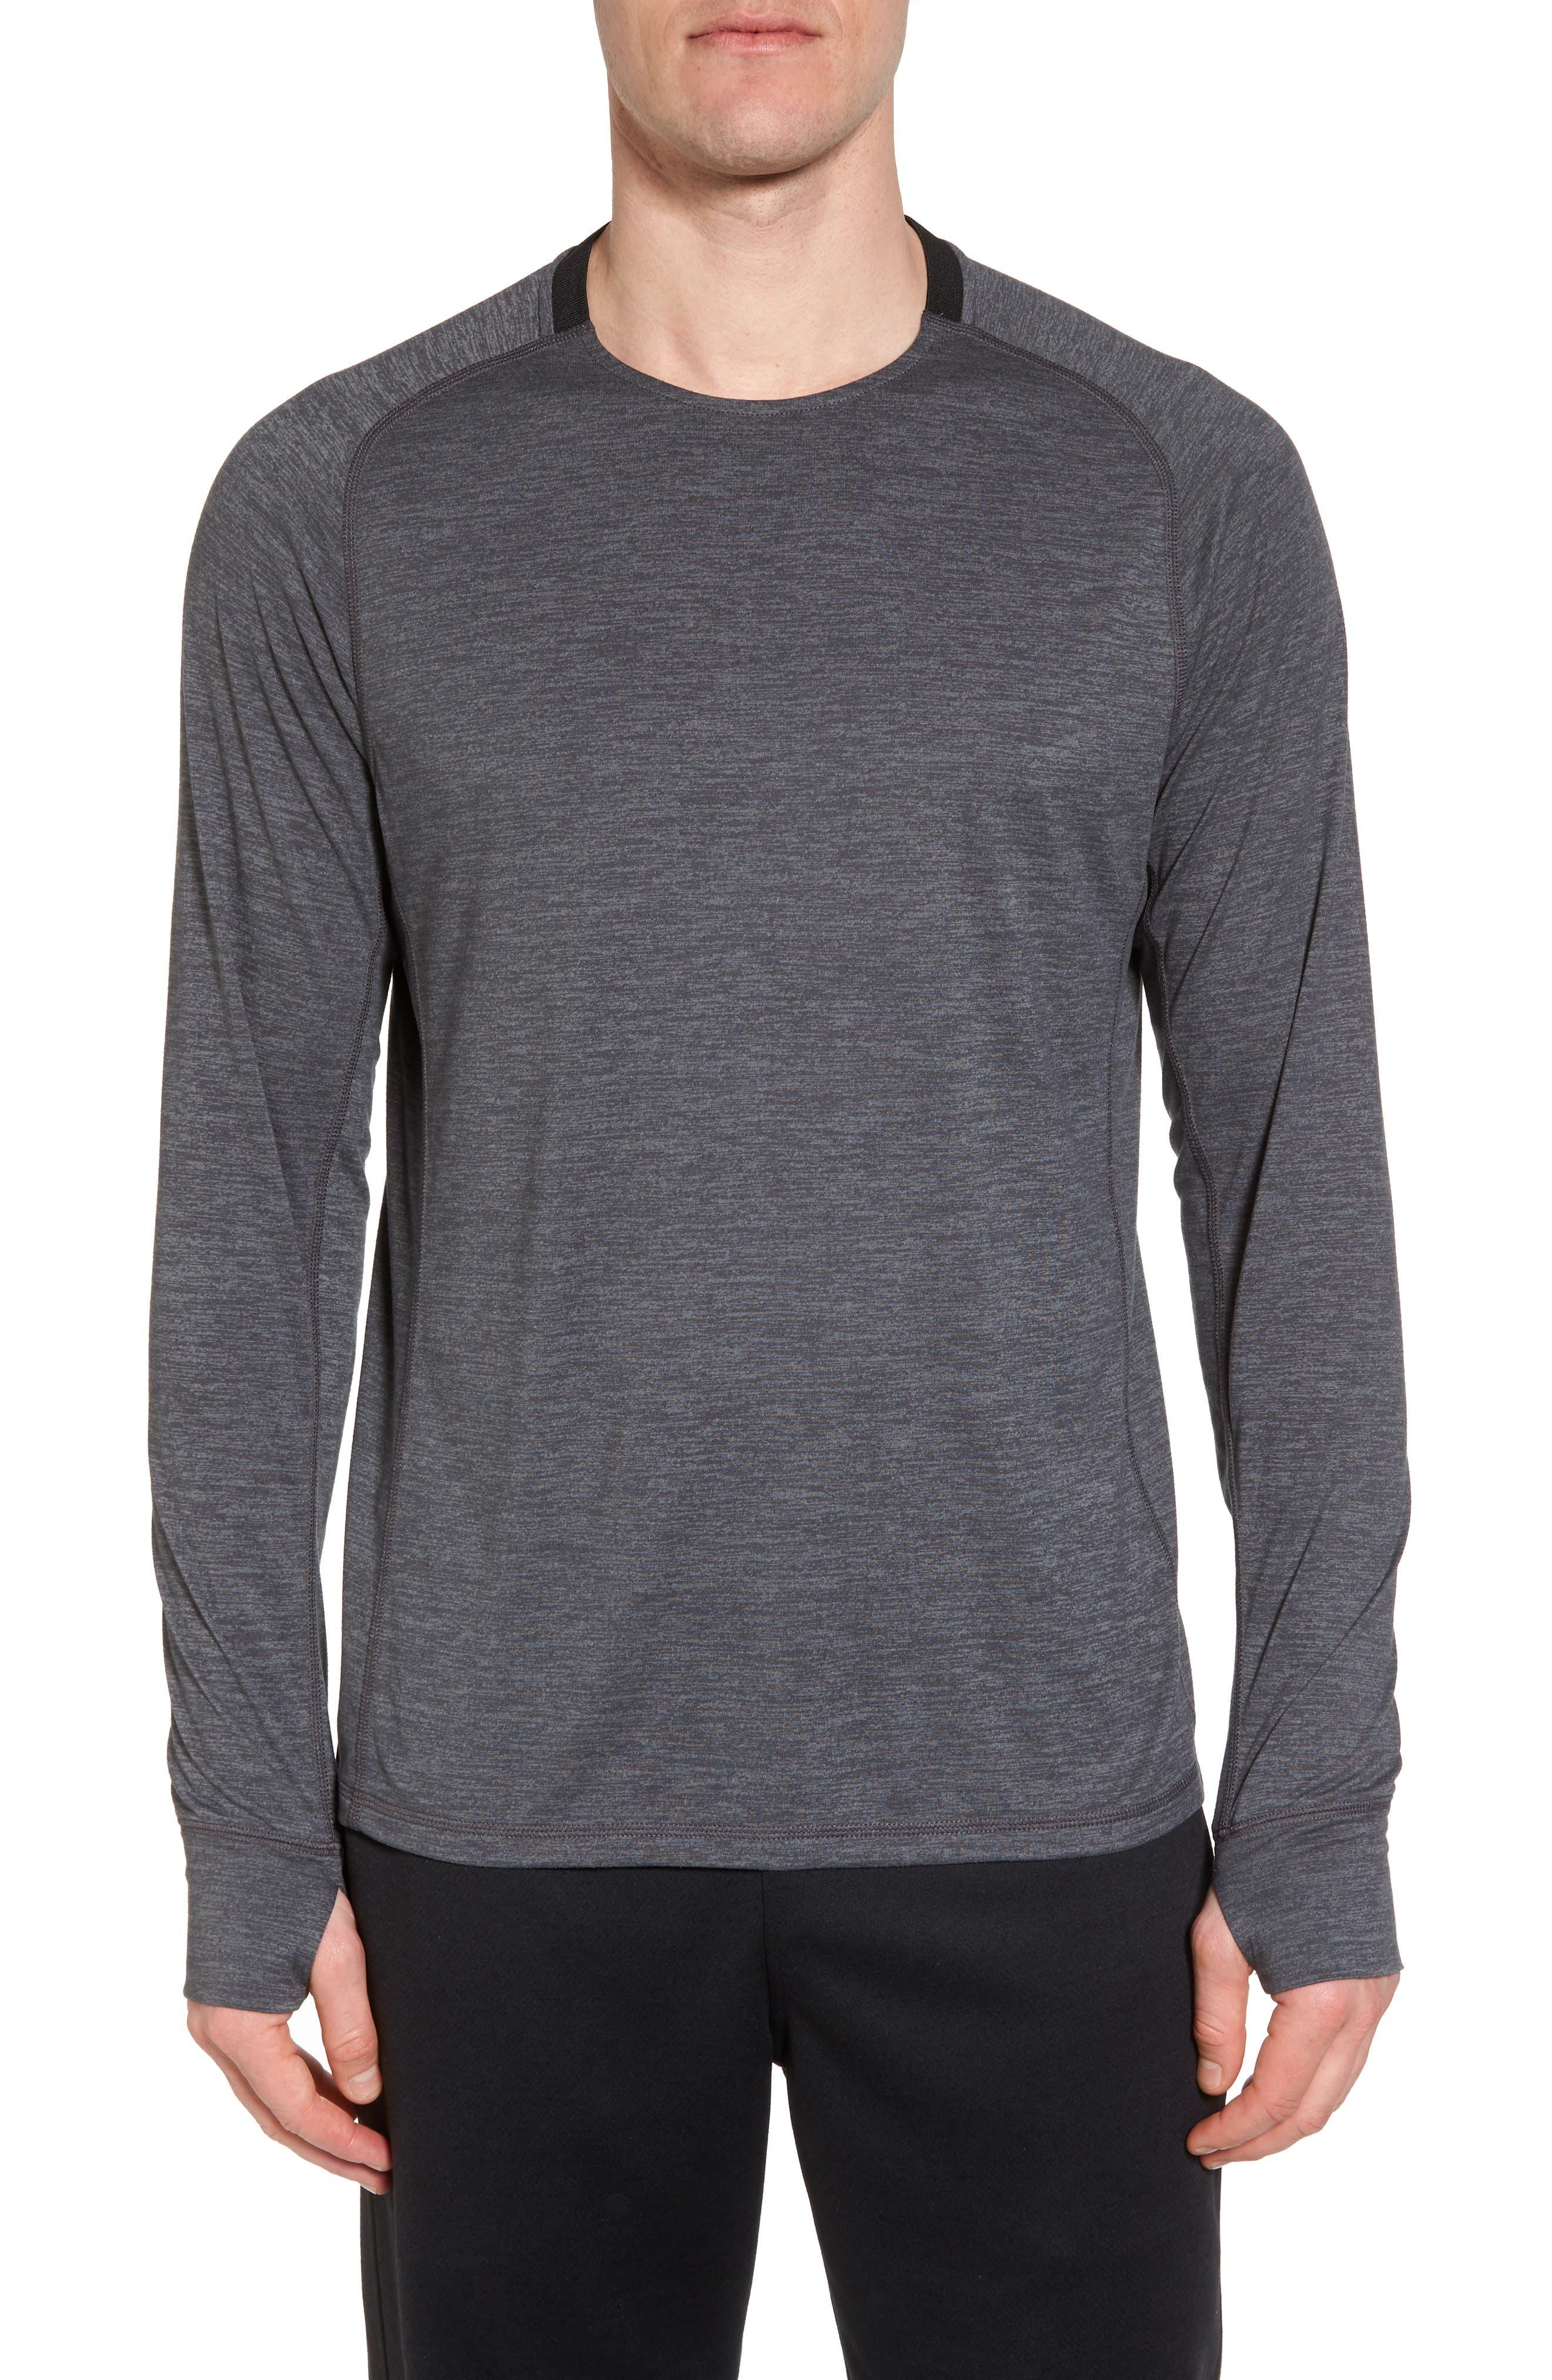 Larosite Athletic Fit T-Shirt,                             Main thumbnail 1, color,                             GREY EBONY MELANGE